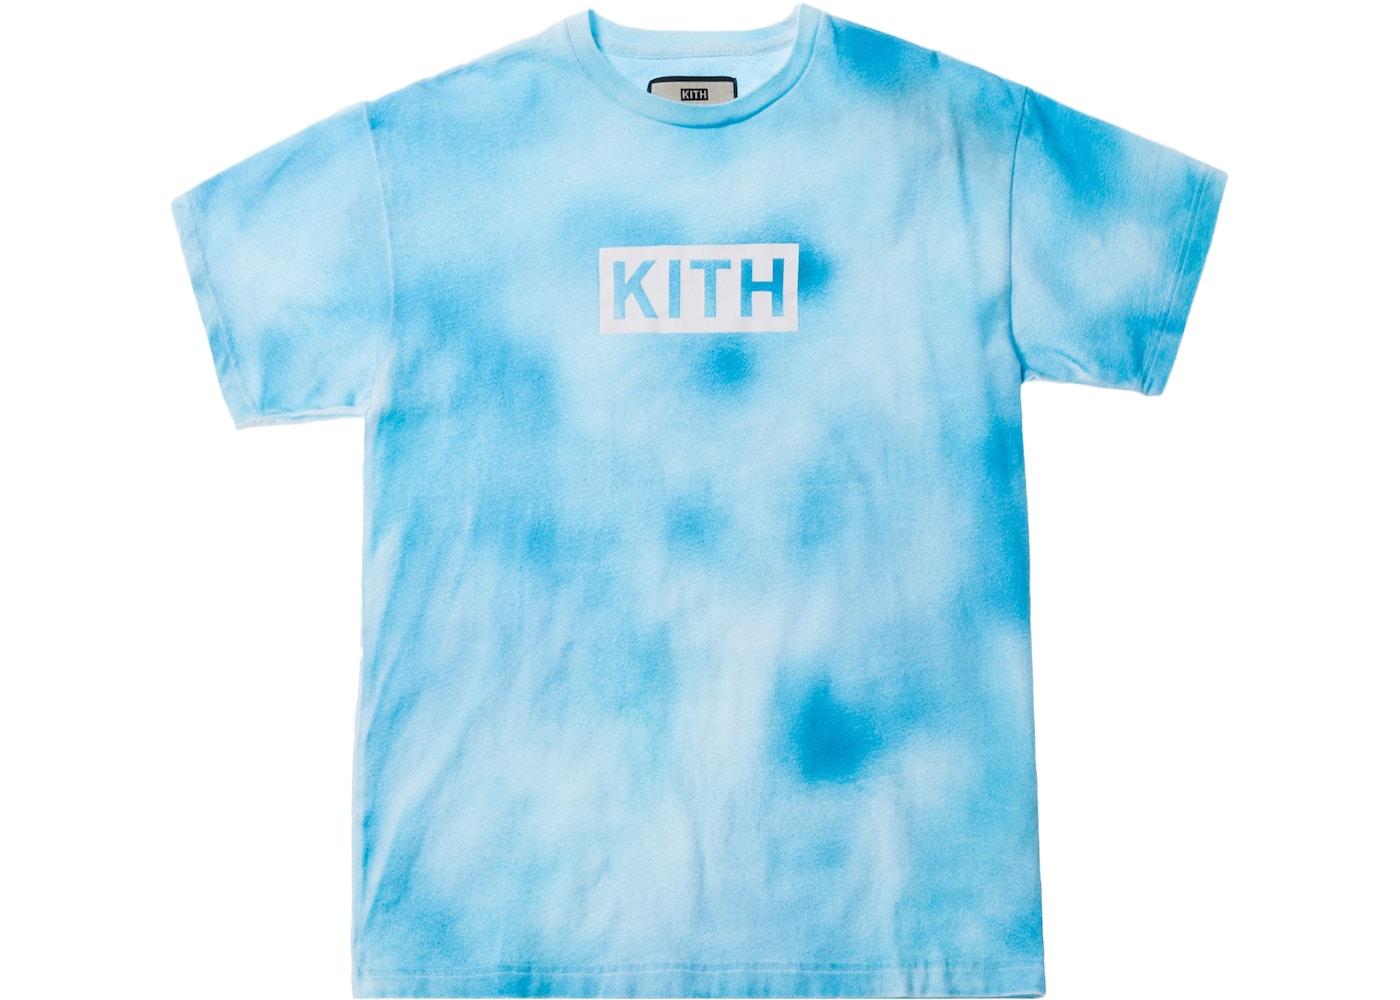 Kith Tie Dye Box Logo Tee Blue Ss18